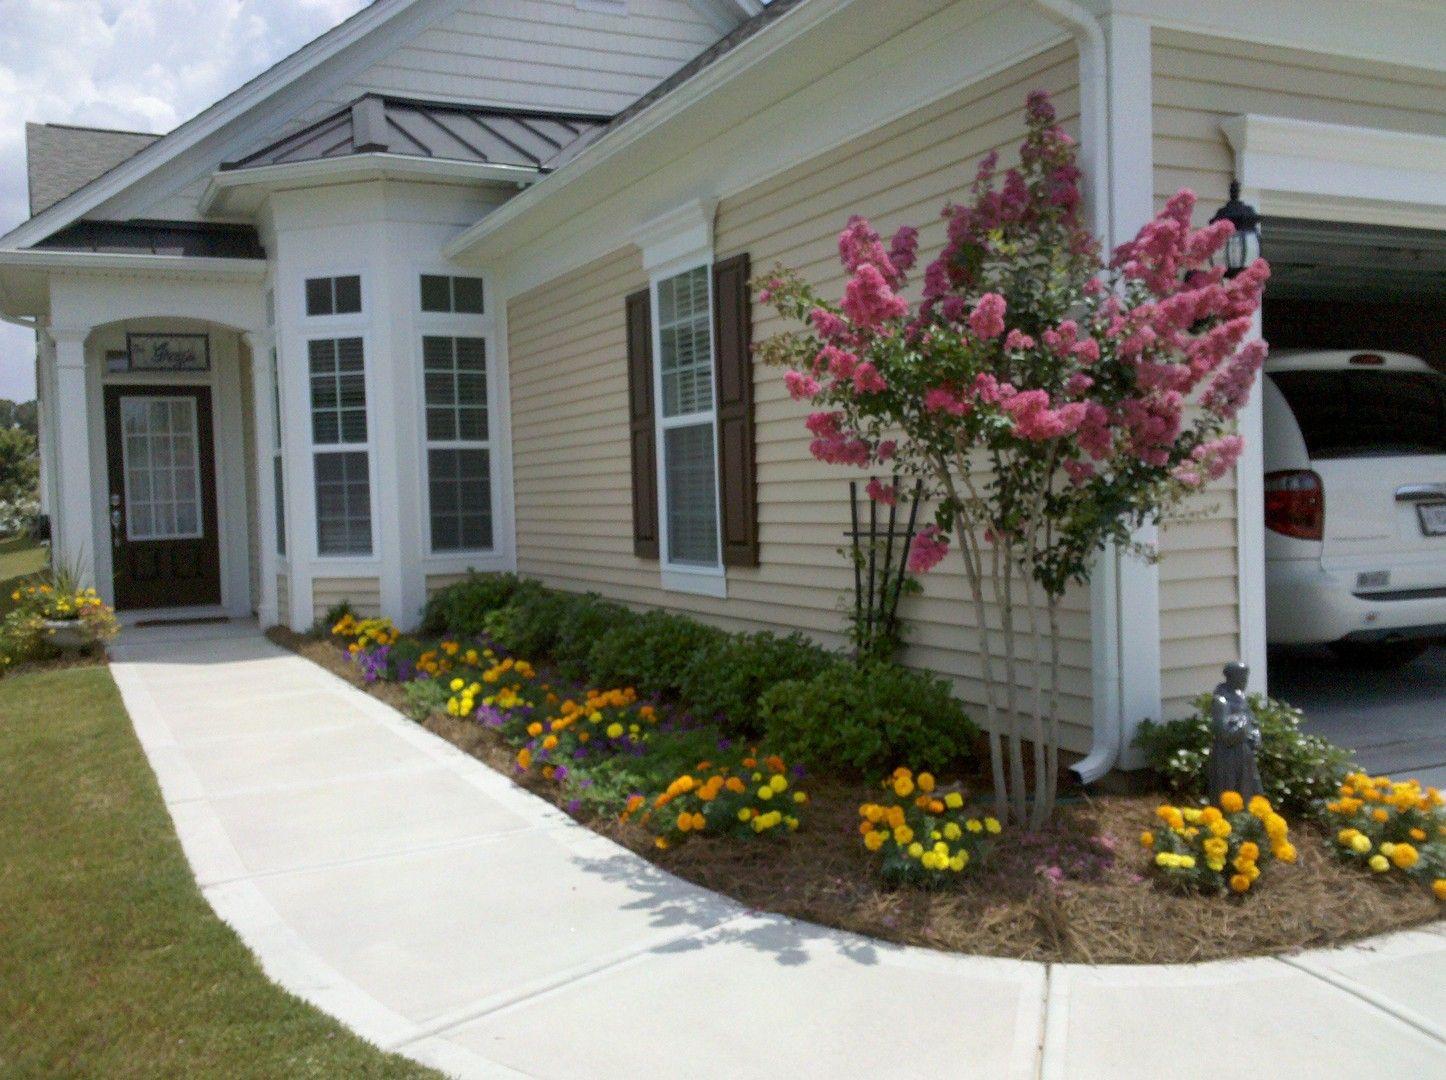 10 Lovely Flower Beds Ideas Front Yard 35 front yard sidewalk garden ideas front yard landscaping 2020